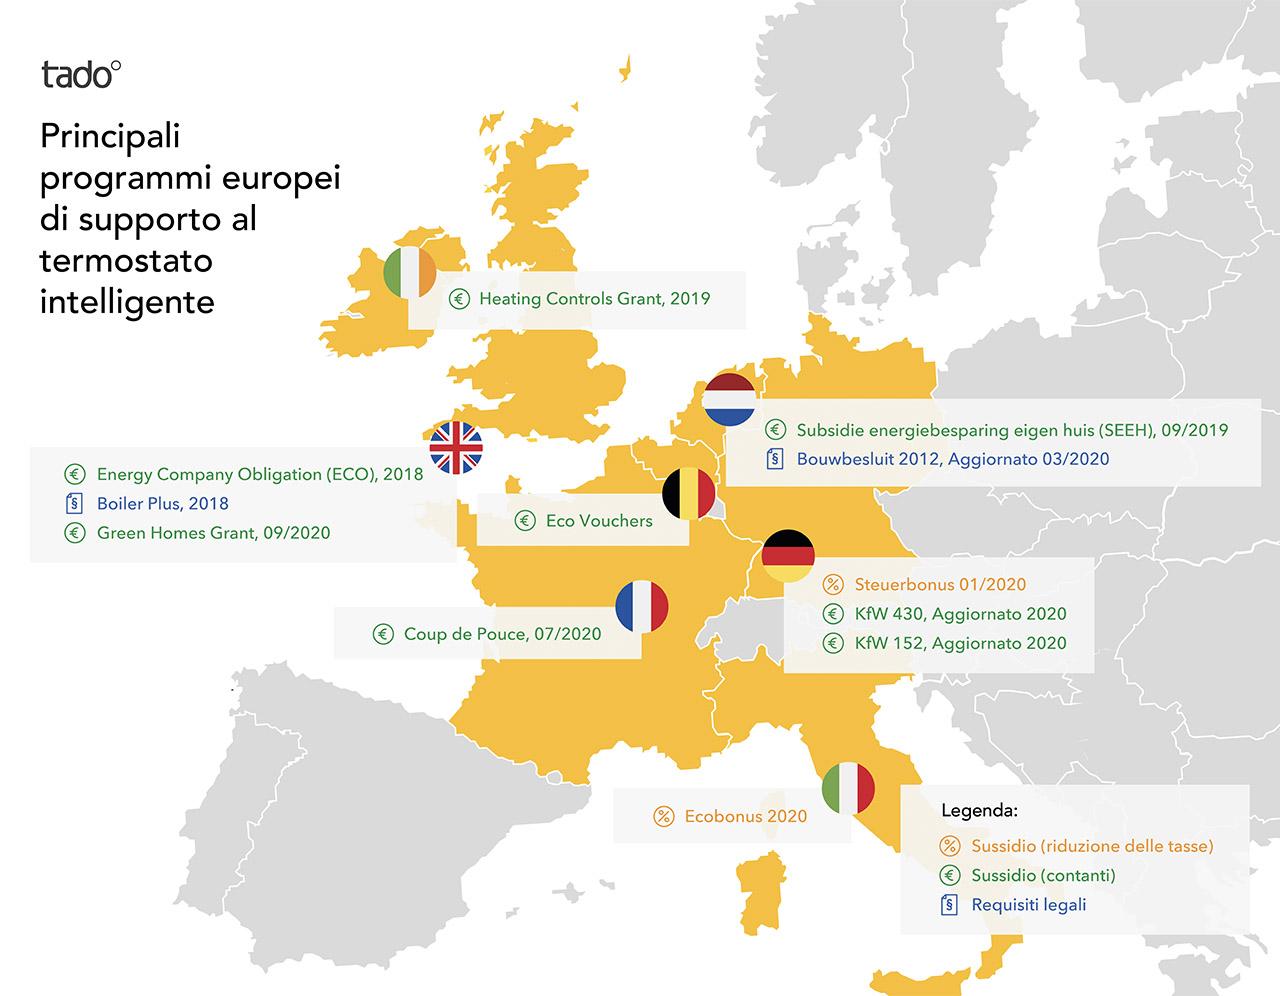 incentivi europei termostato smart tado